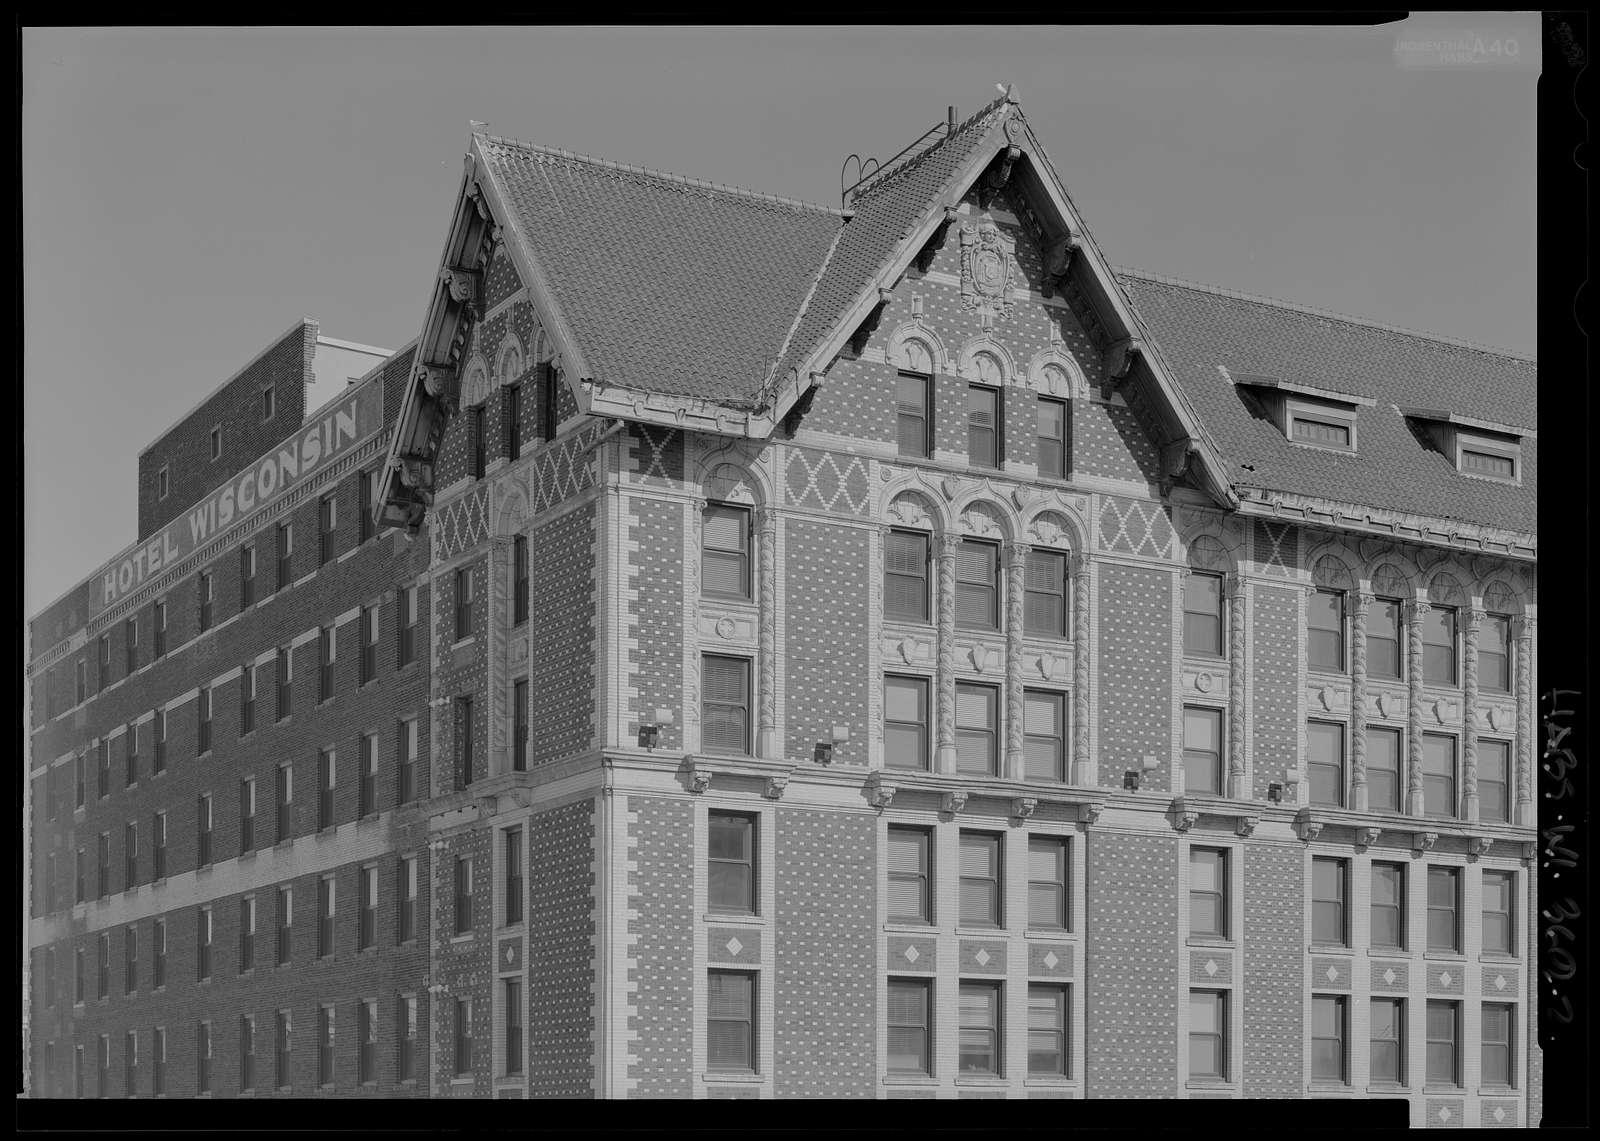 Hotel Wisconsin, 720 North Third Street, Milwaukee, Milwaukee County, WI